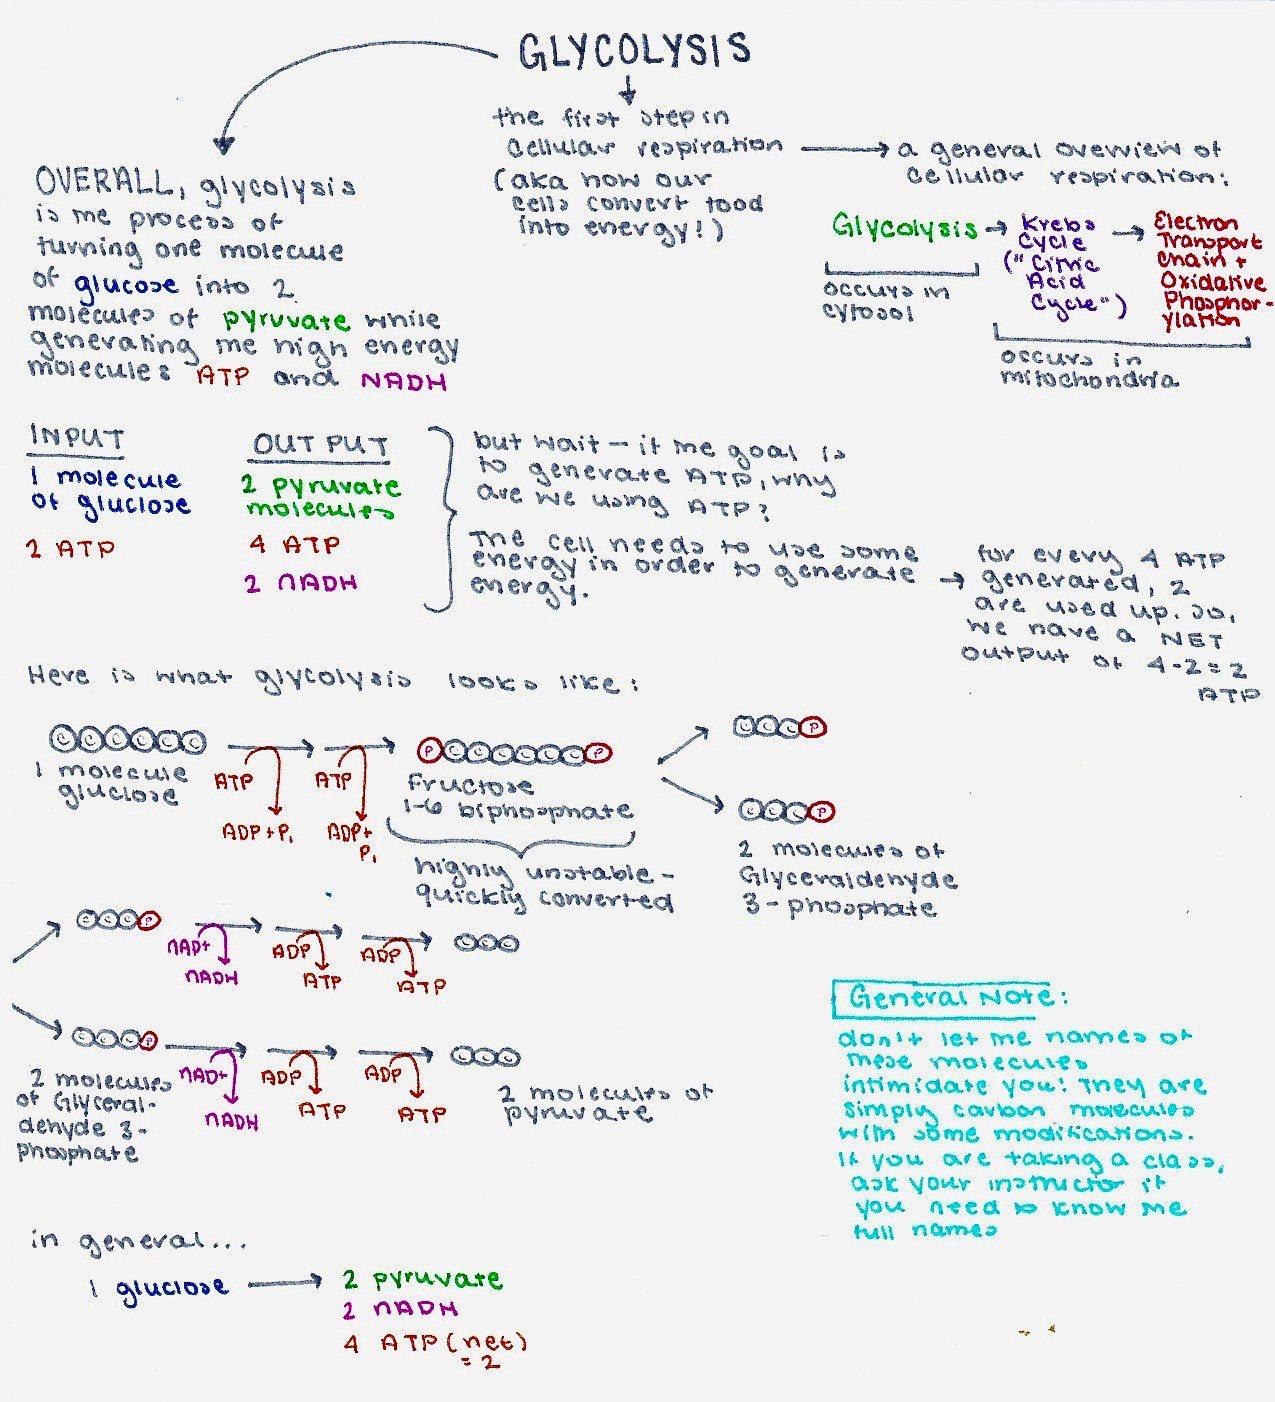 Glycolysis (Cellular Respiration) — Summary & Steps - Expii